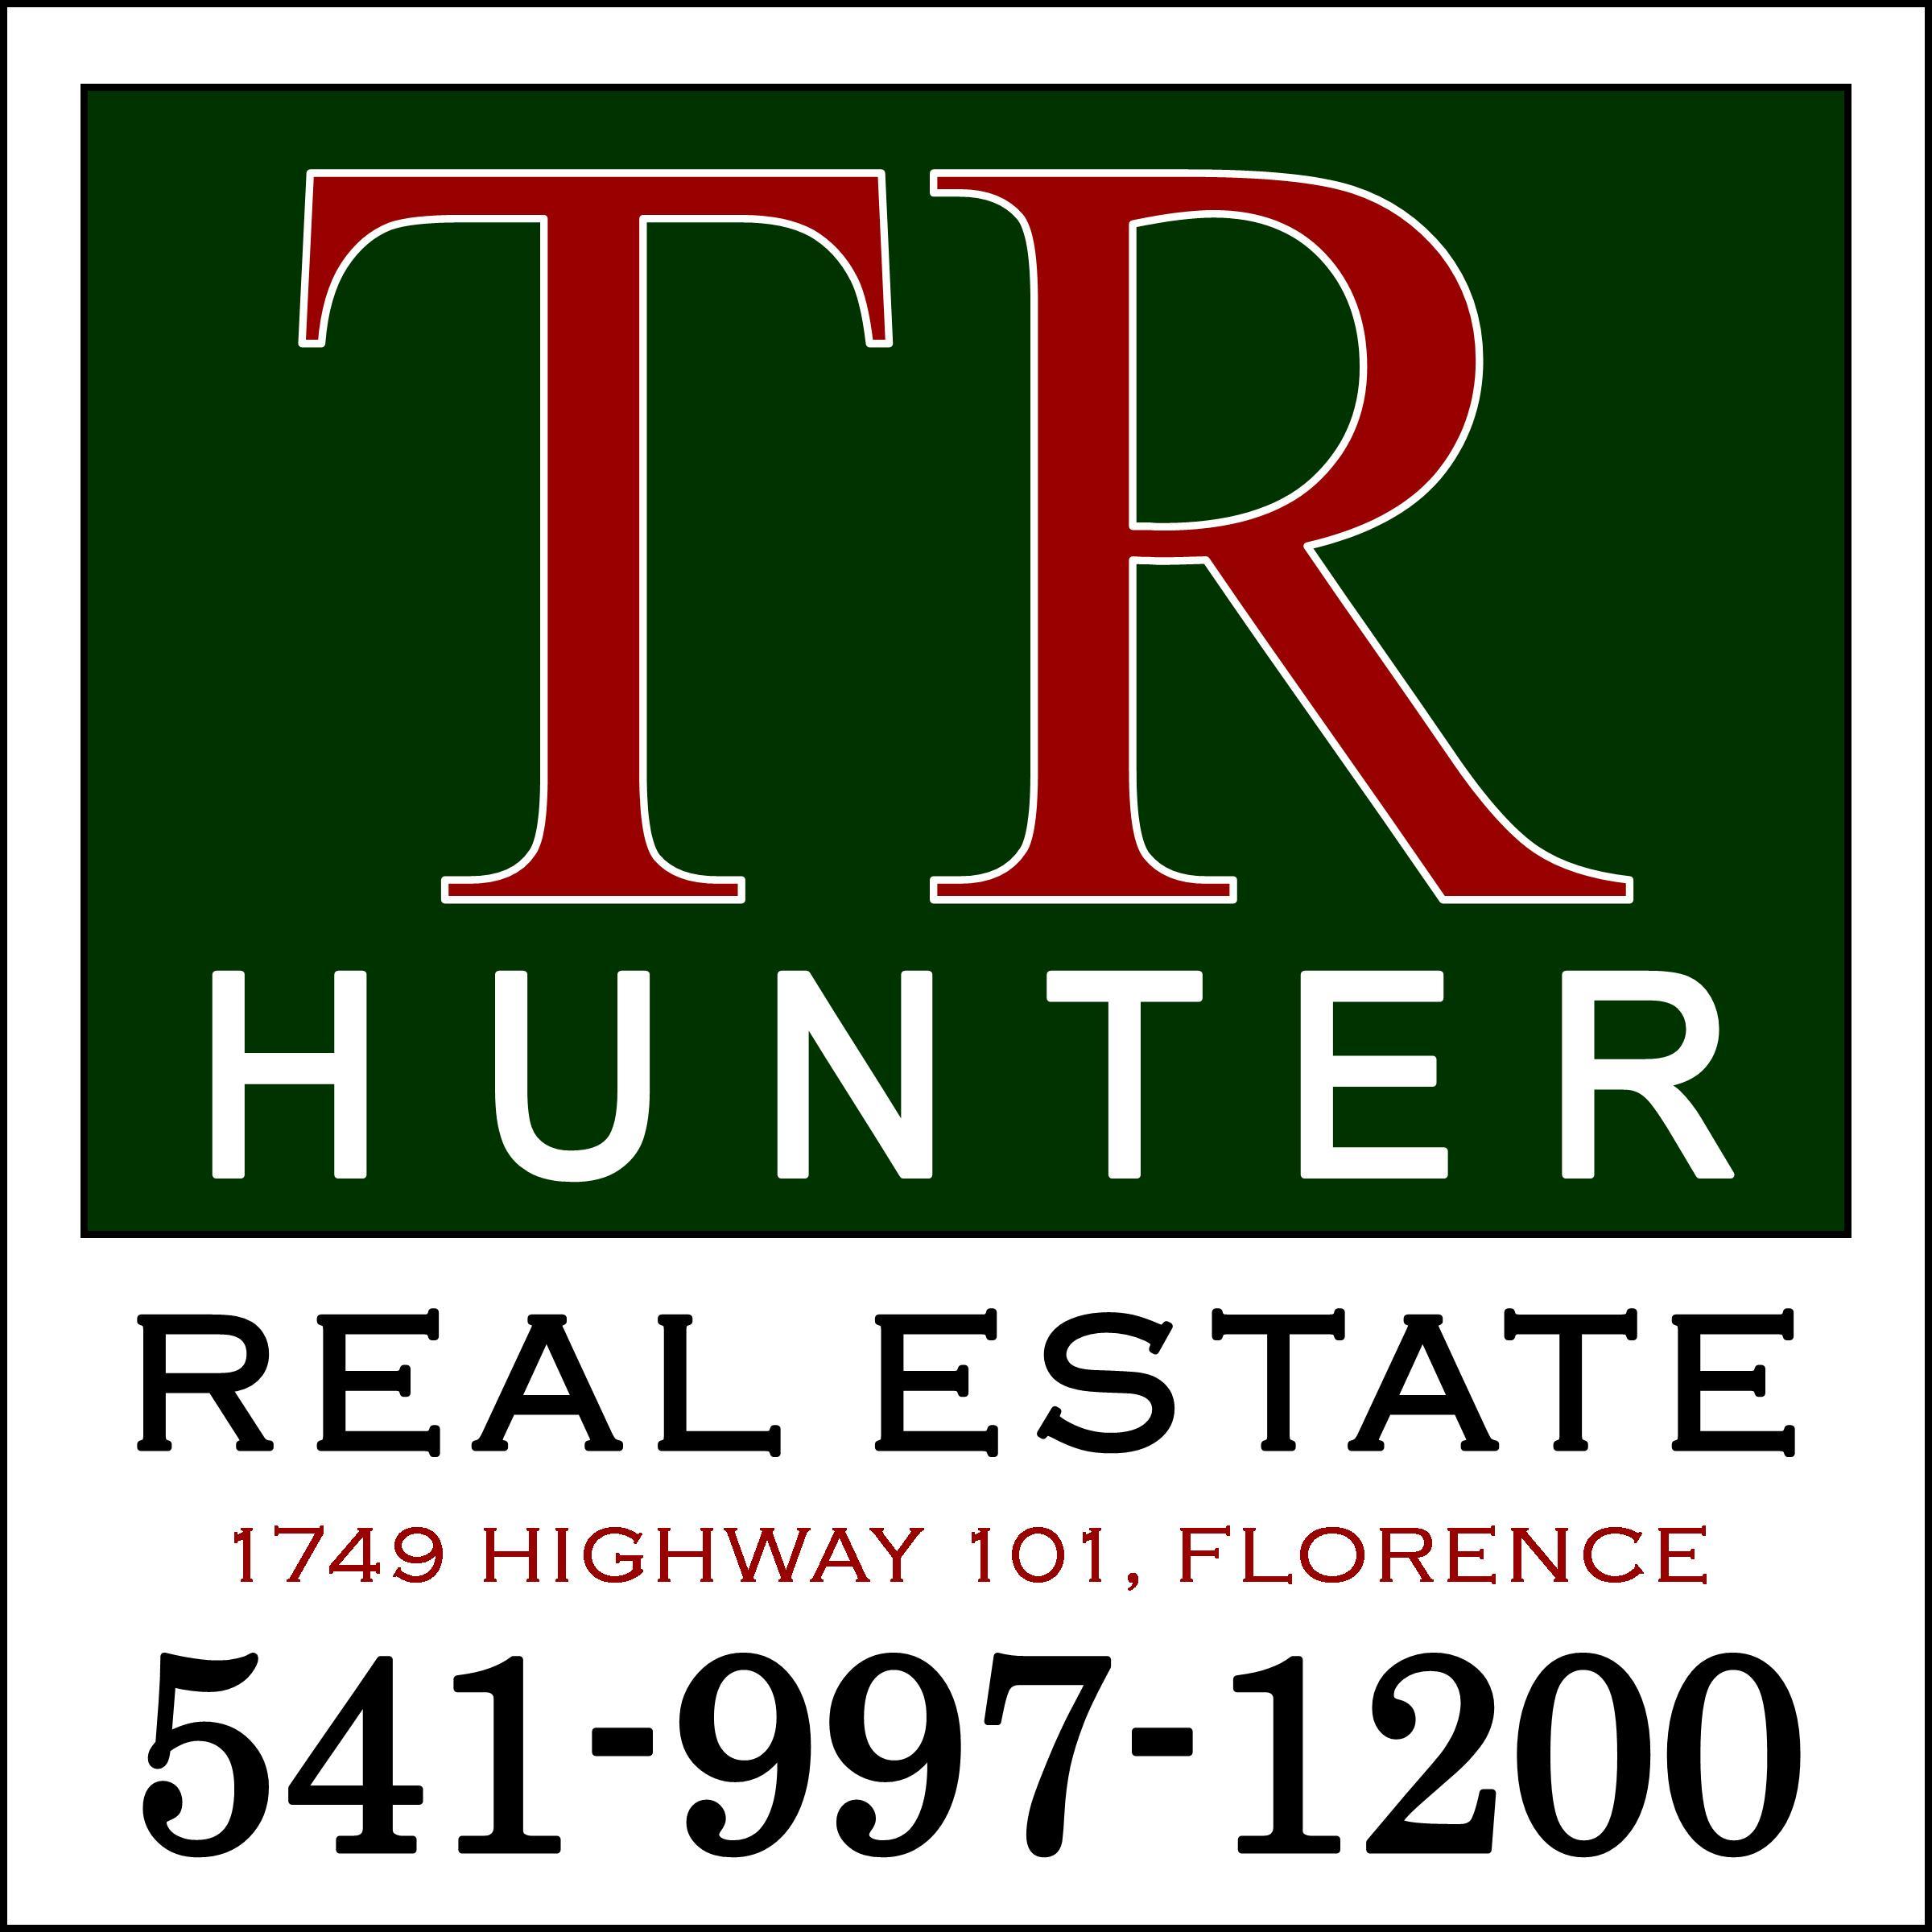 TR Hunter Real Estate